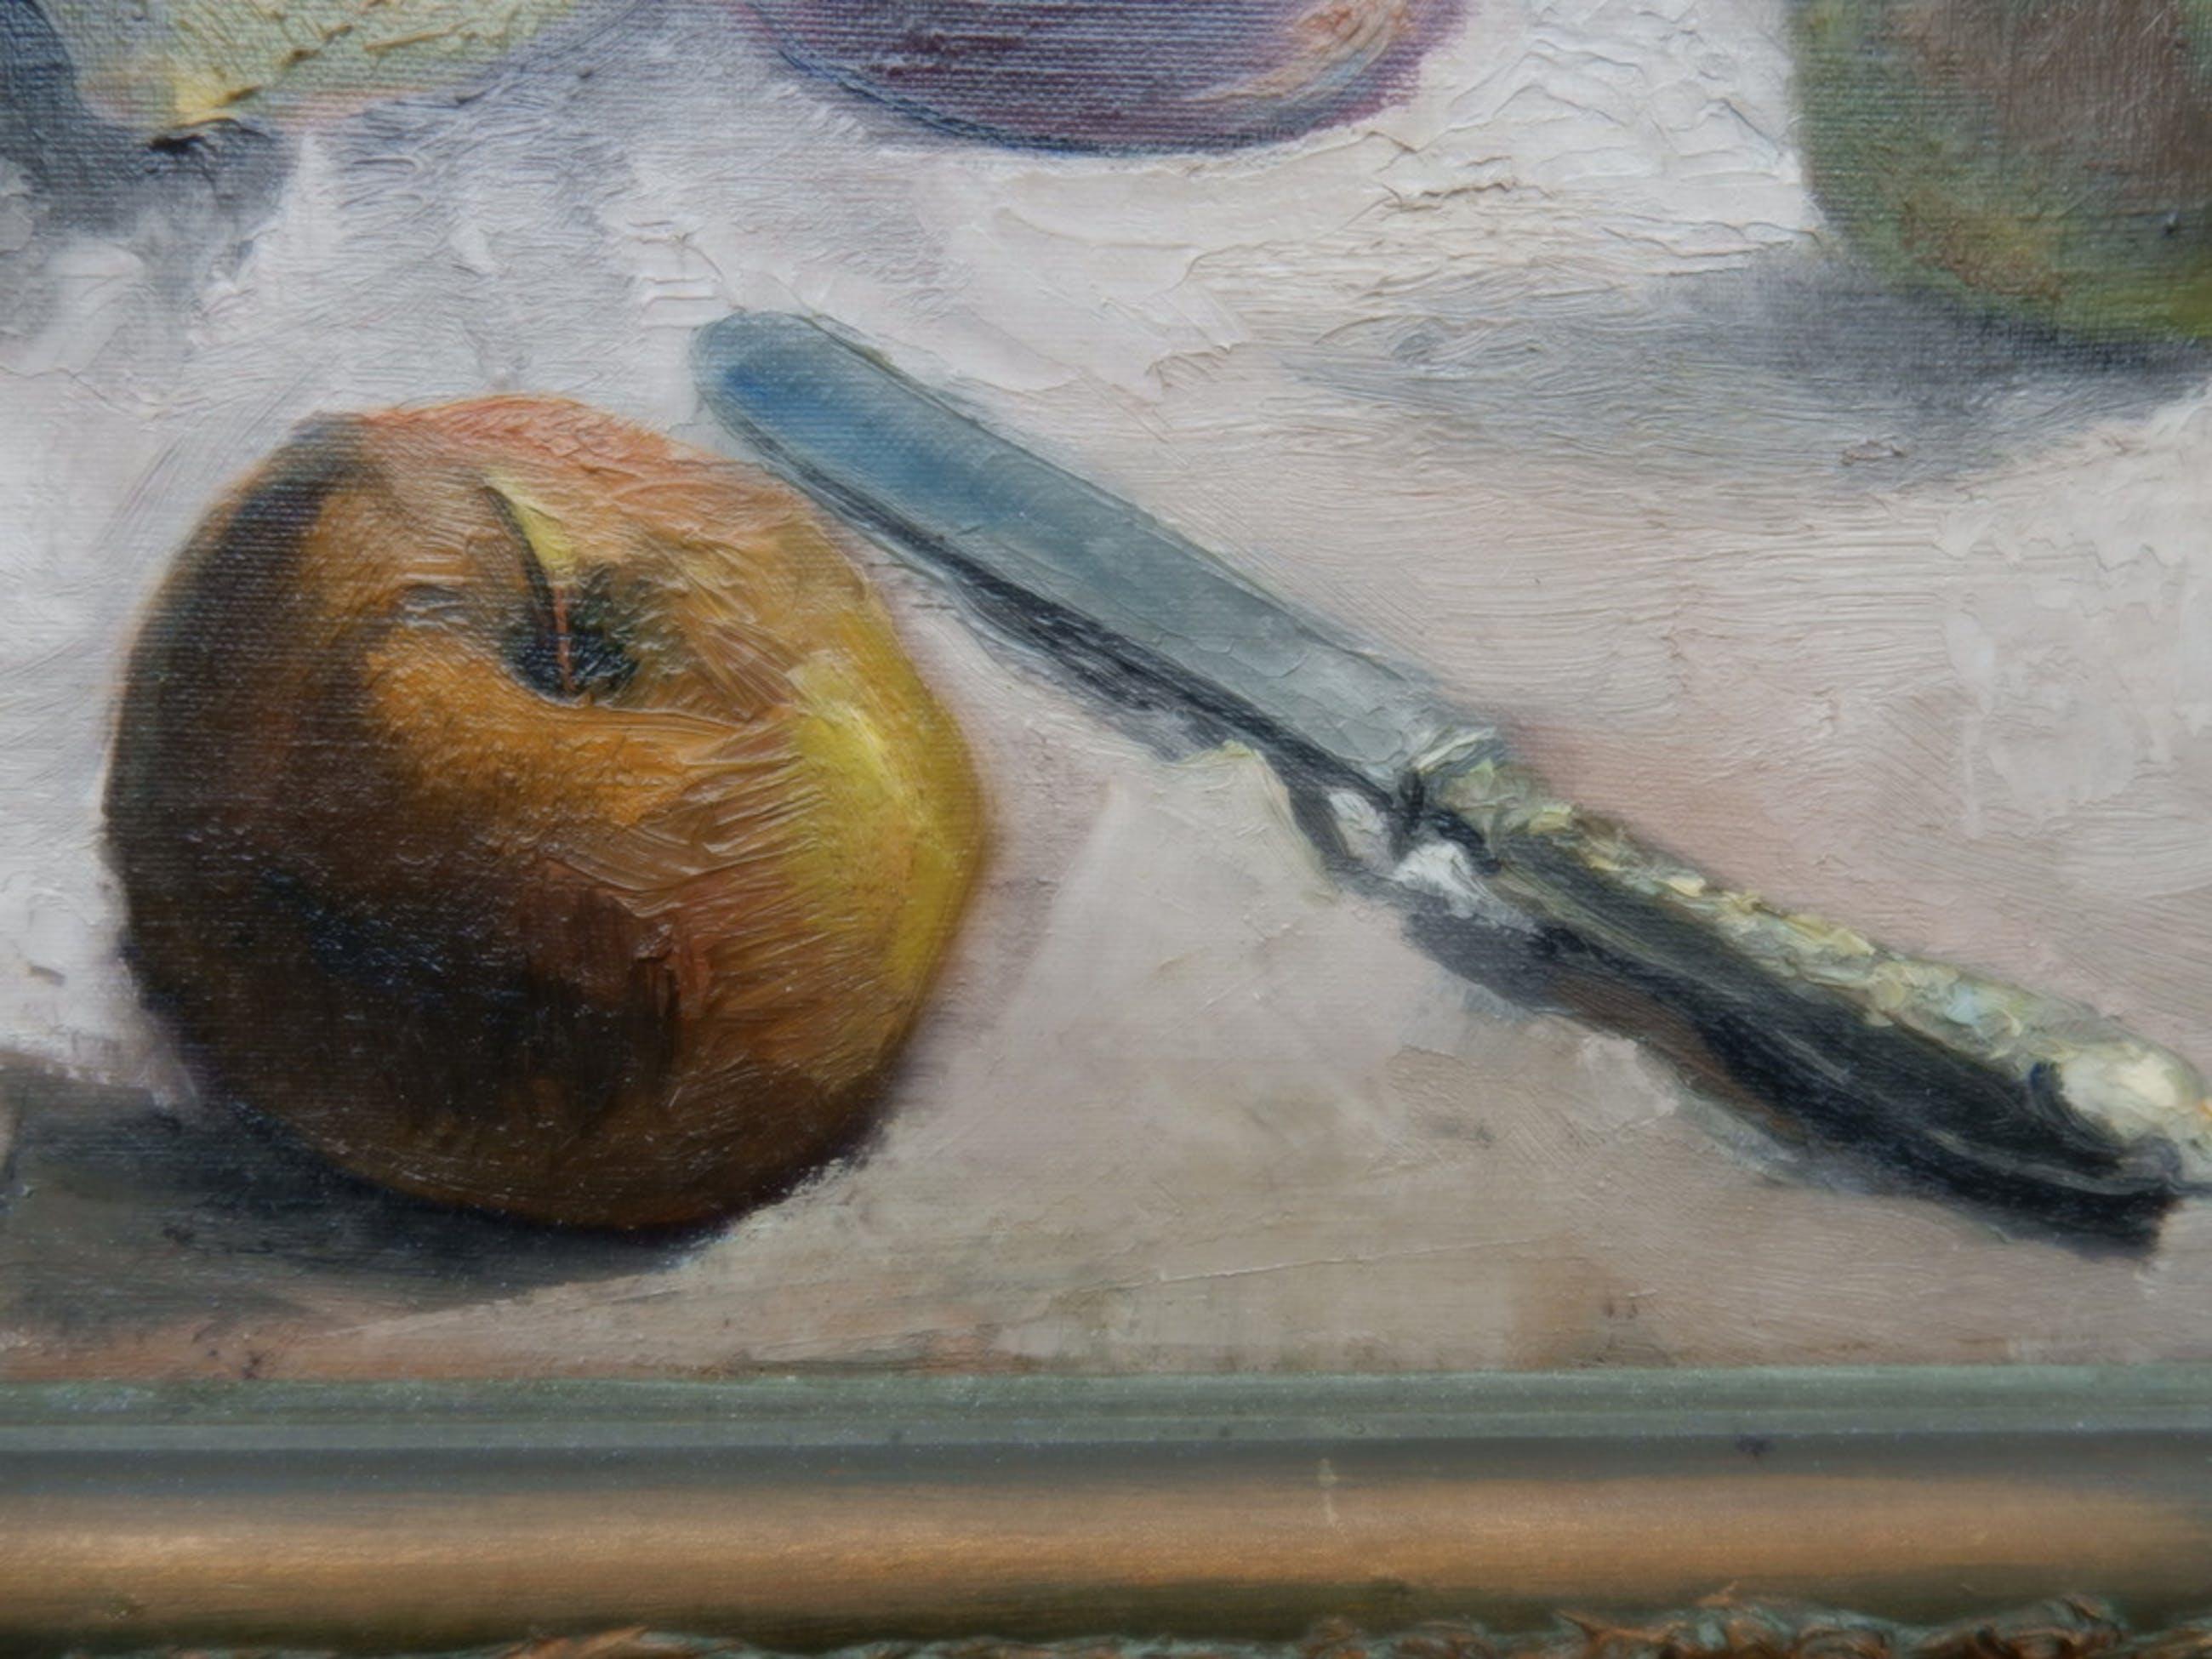 onbekende kunstschilder, stilleven, prachtig geschilderd, impressionistisch. kopen? Bied vanaf 75!